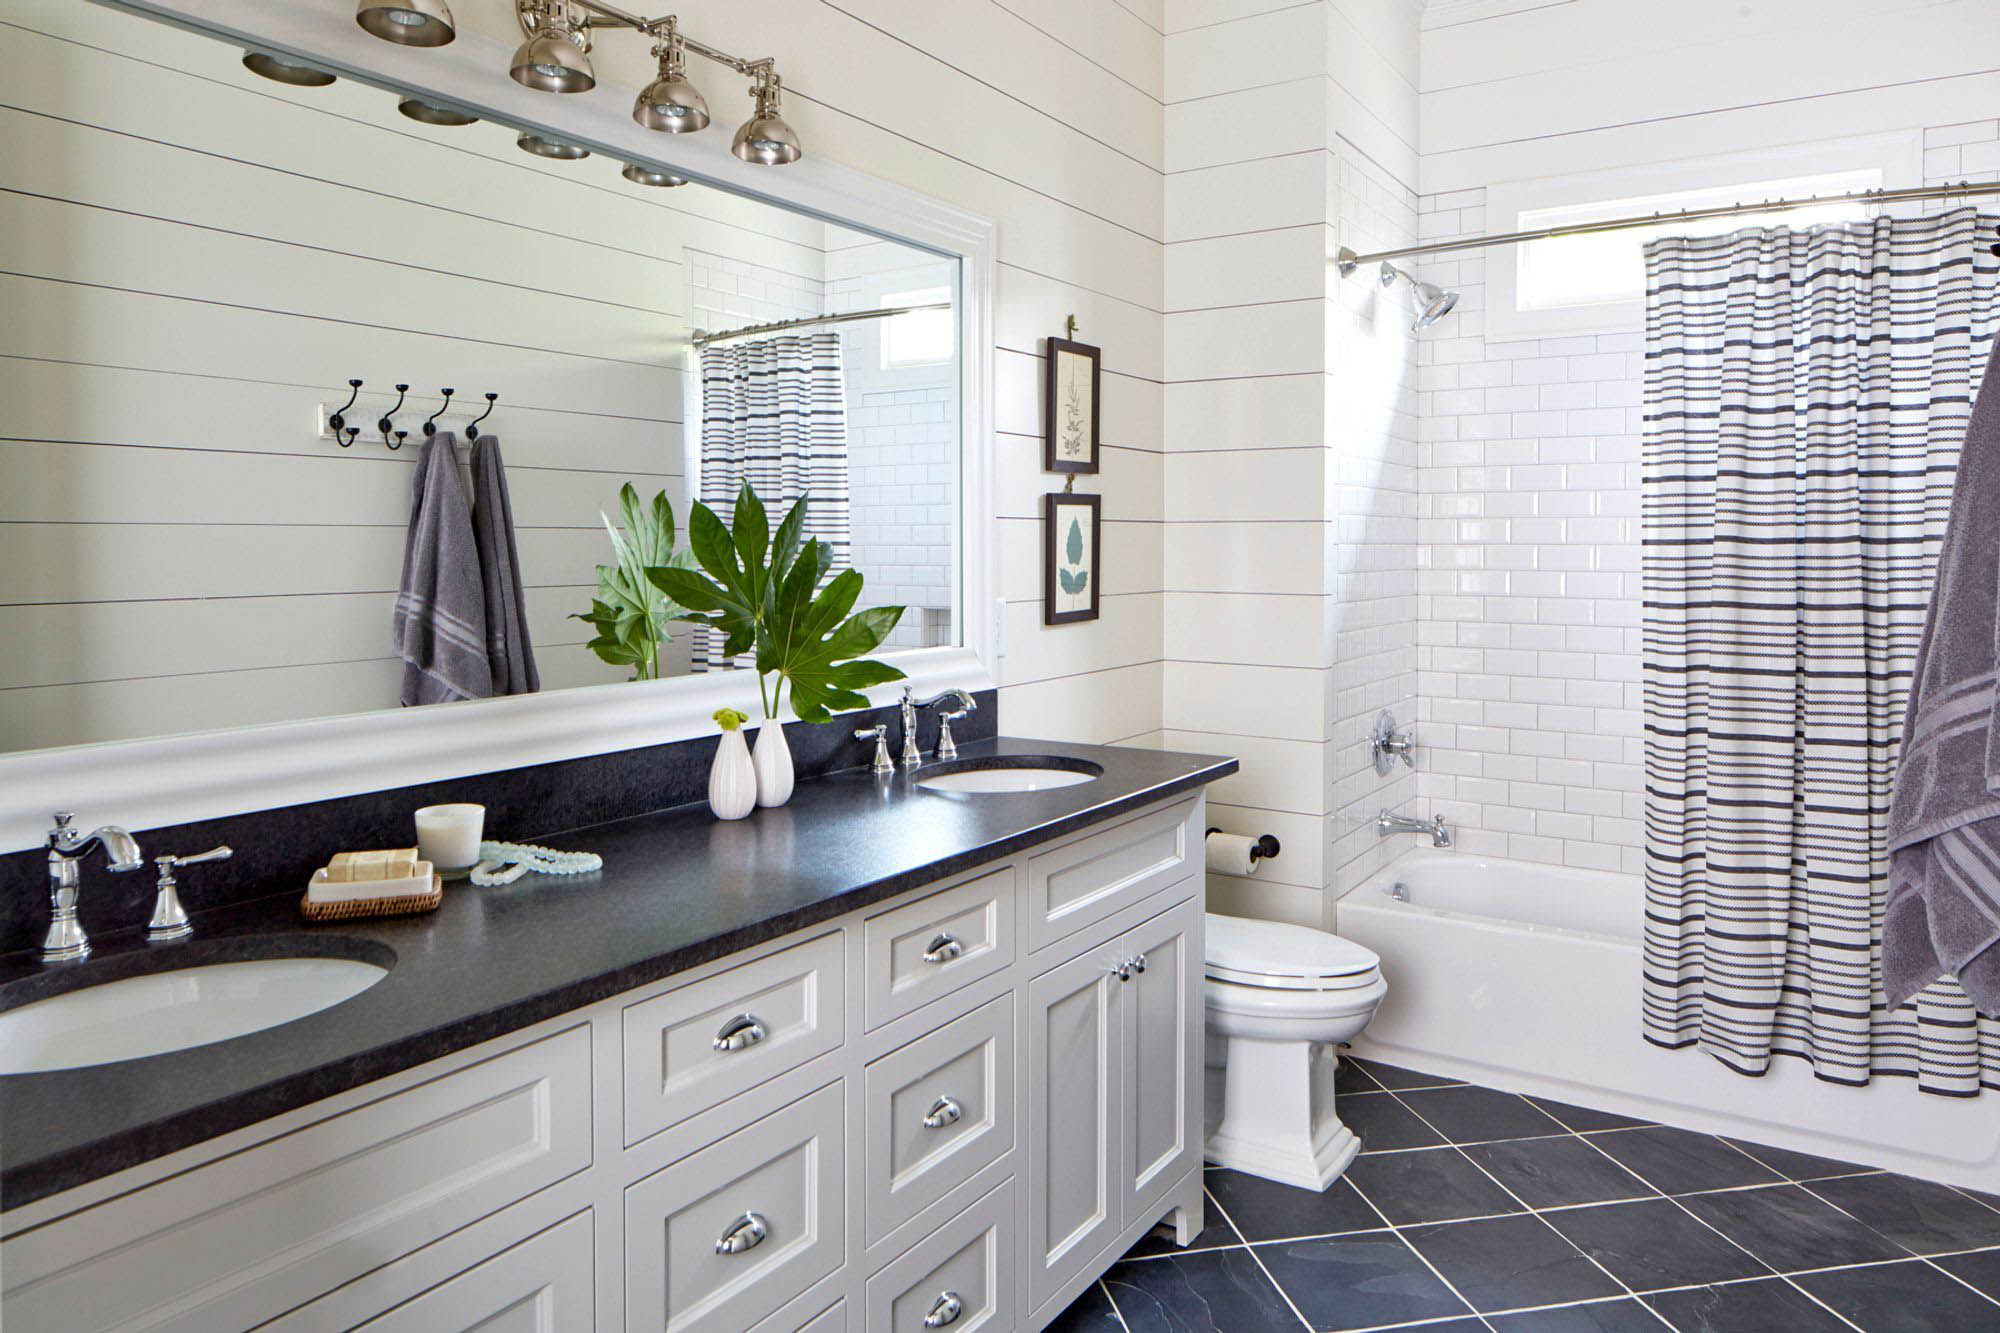 White bathroom with black granite countertops. Shaker style cabinets. White shower tile. White shiplap walls.